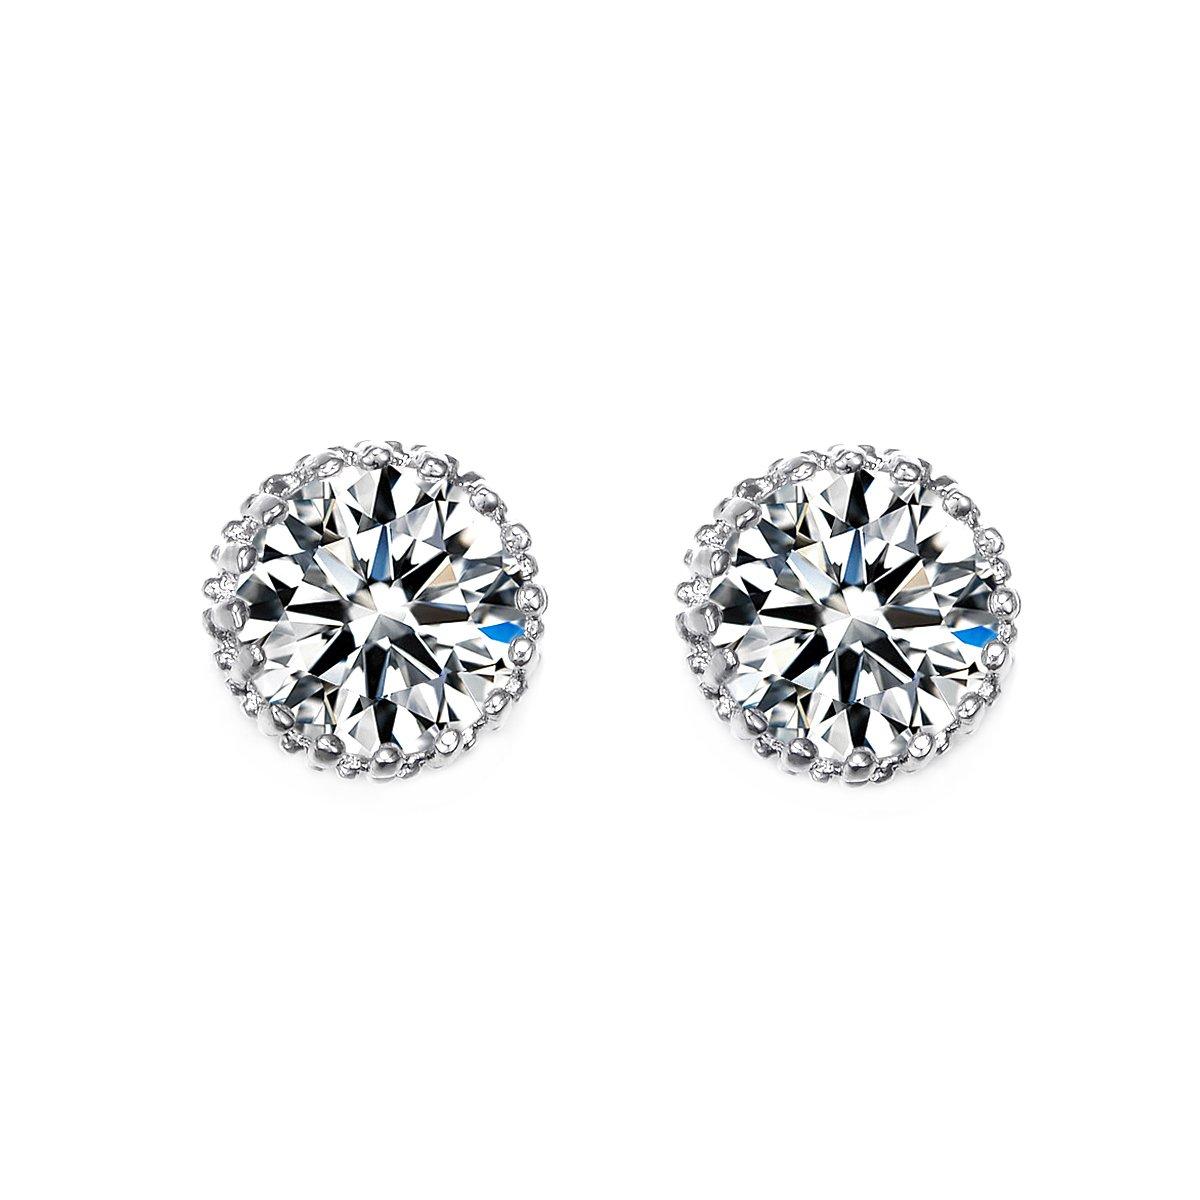 UMODE Jewelry Brilliant Round Cut Heart & Arrows 2 Carat Cubic Zirconia Cz Diamond Stud Earrings yiwu xilin trading company ltd. UE0013CA